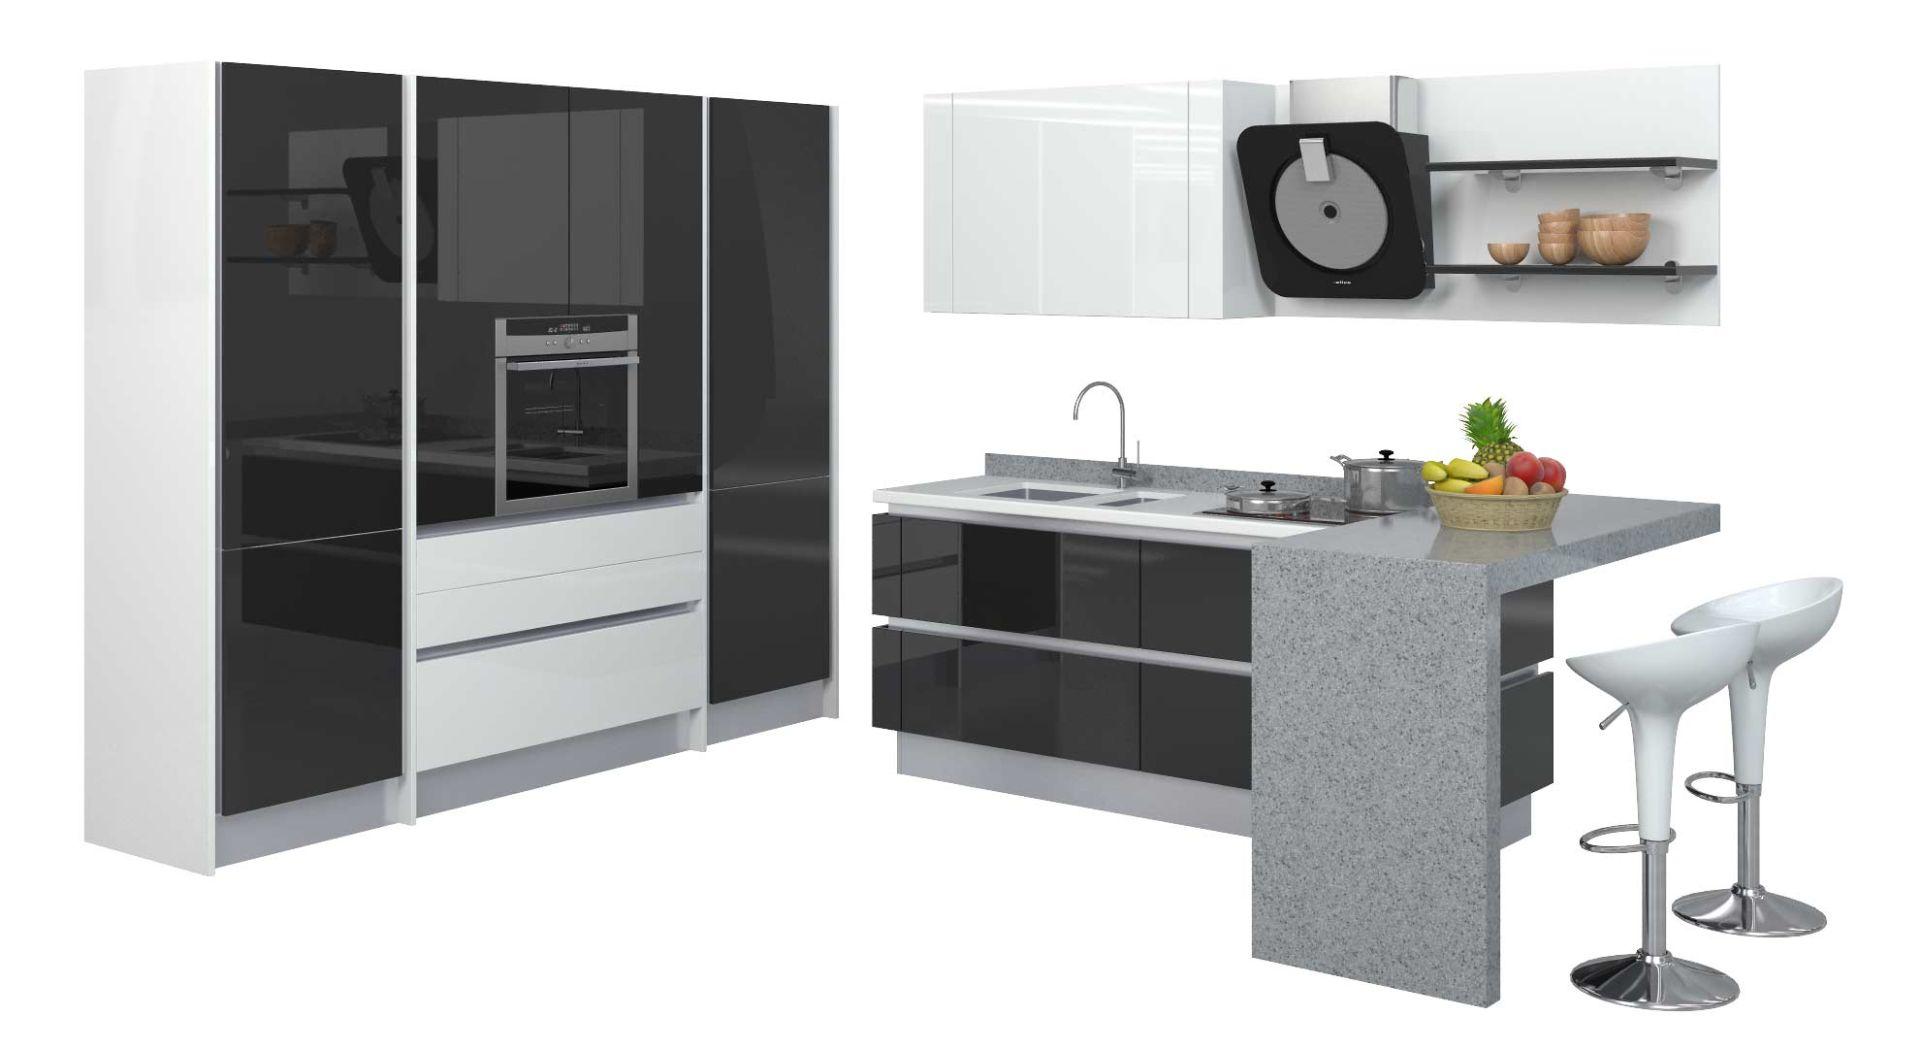 Черно-белые кухни в г. Магнитогорск